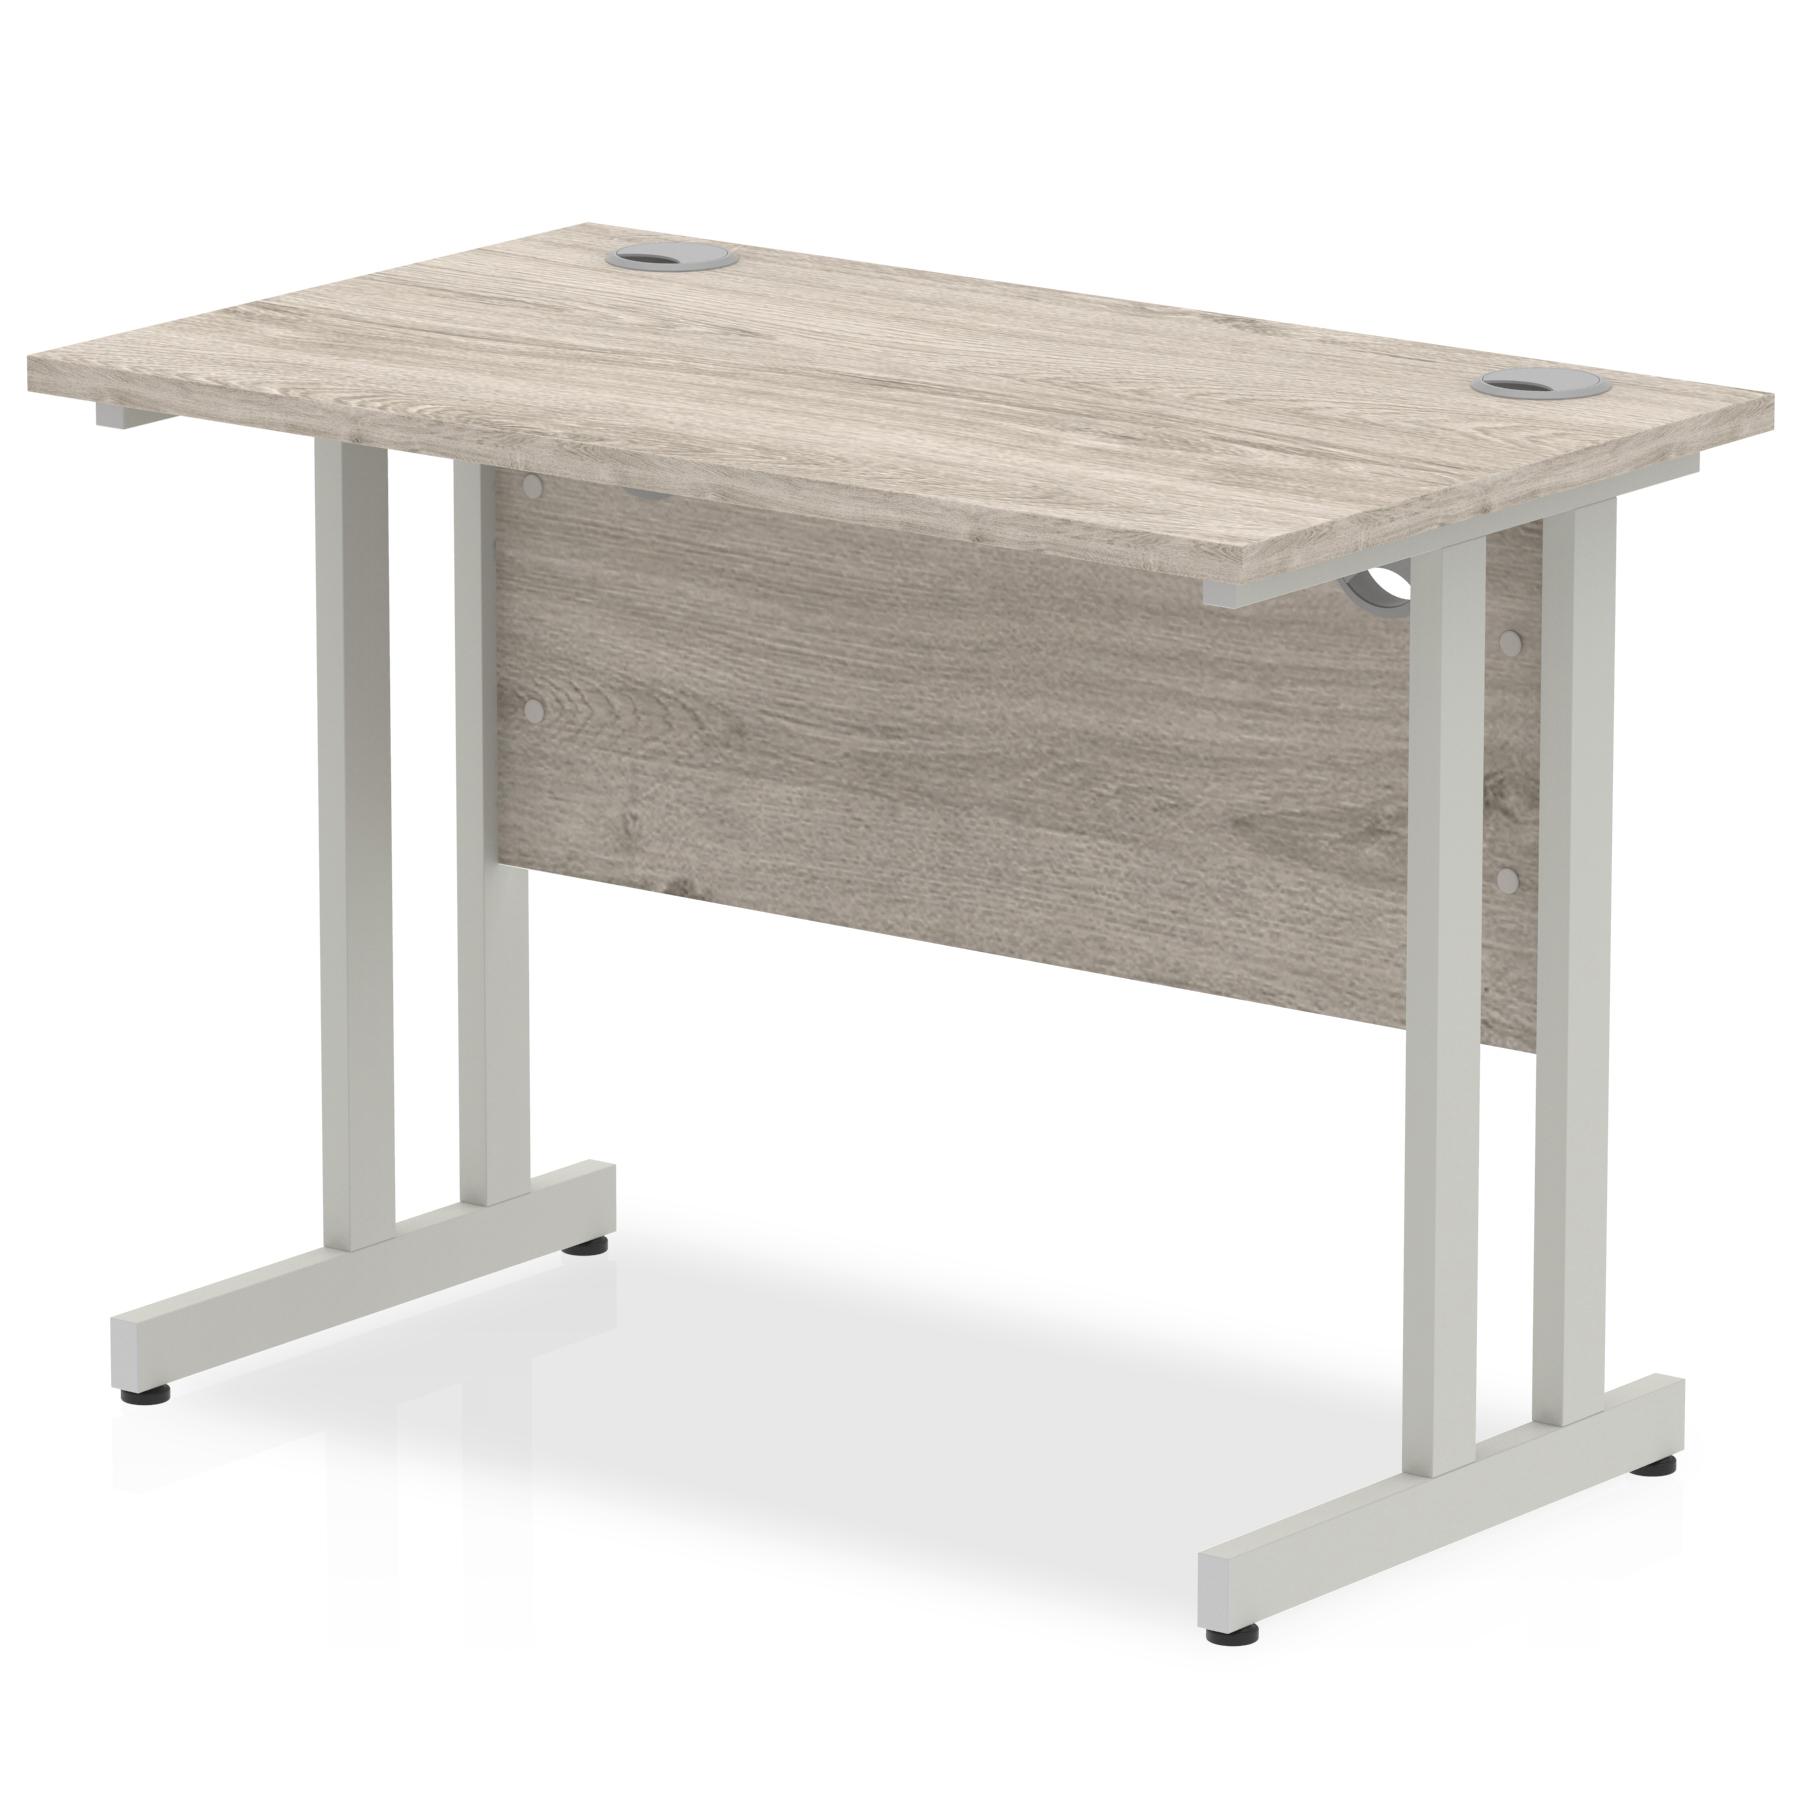 Trexus Rectangular Slim Desk Silver Cantilever Leg 1000x600mm Grey Oak Ref I003063